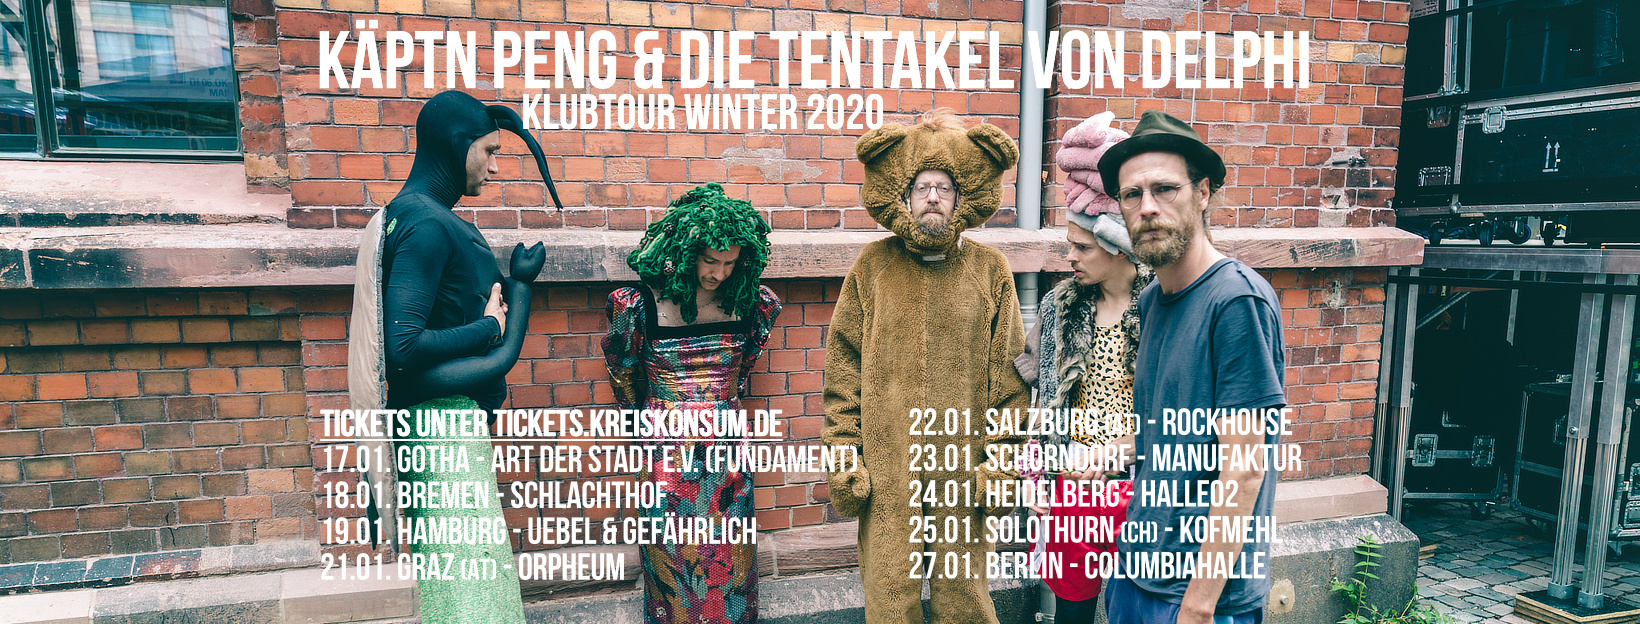 Käptn Peng & Die Tentakel von Delphi - Klubtour Winter 2020